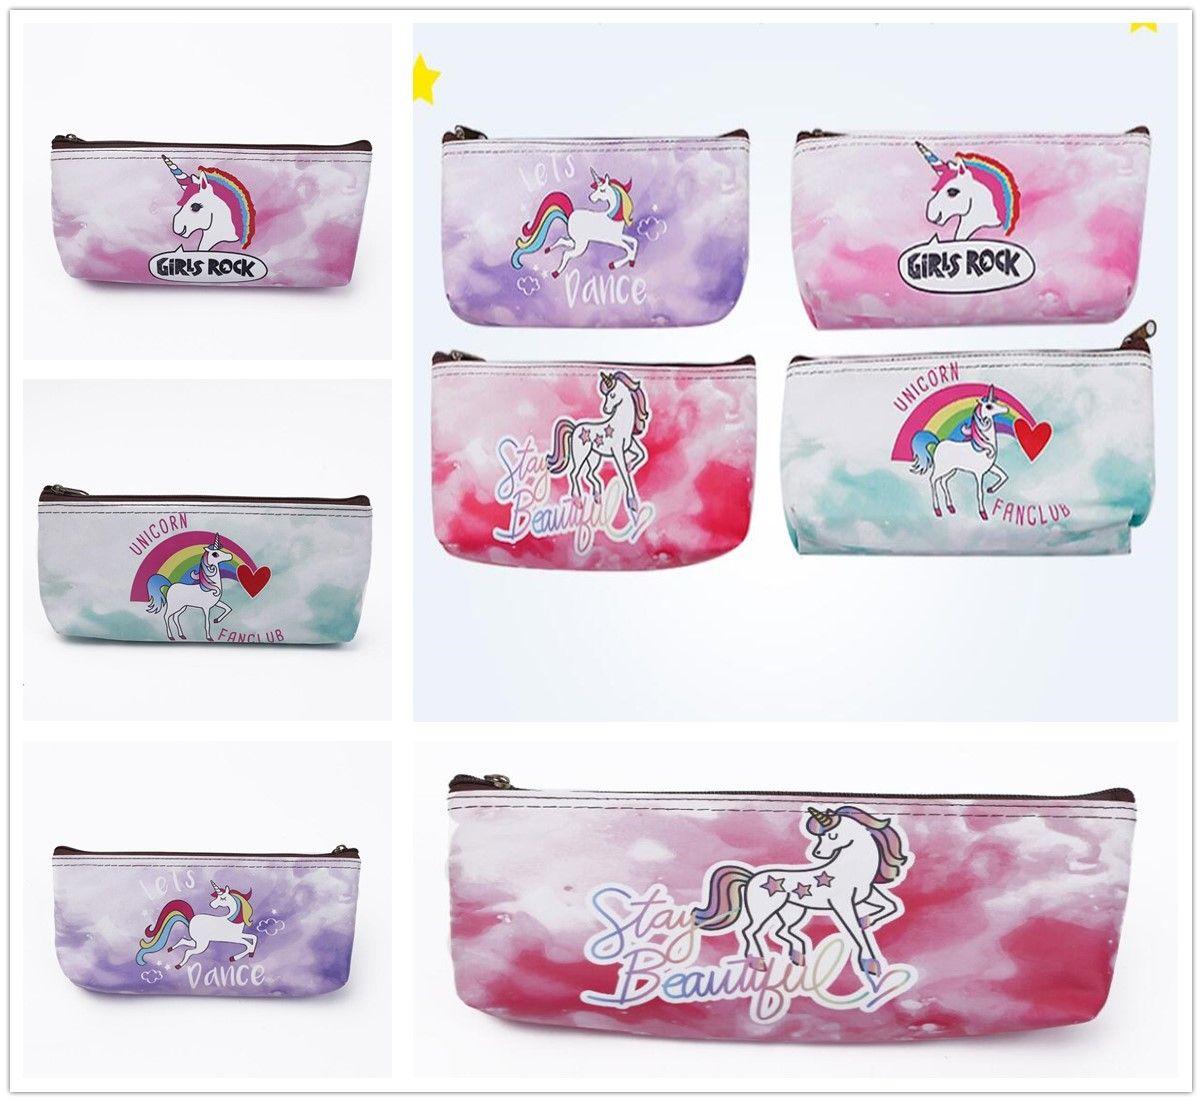 New Wonderful Unicorn Pattern PU Storage Bag Home Zipper Learning Case Simple Gift Decor Free Shipping